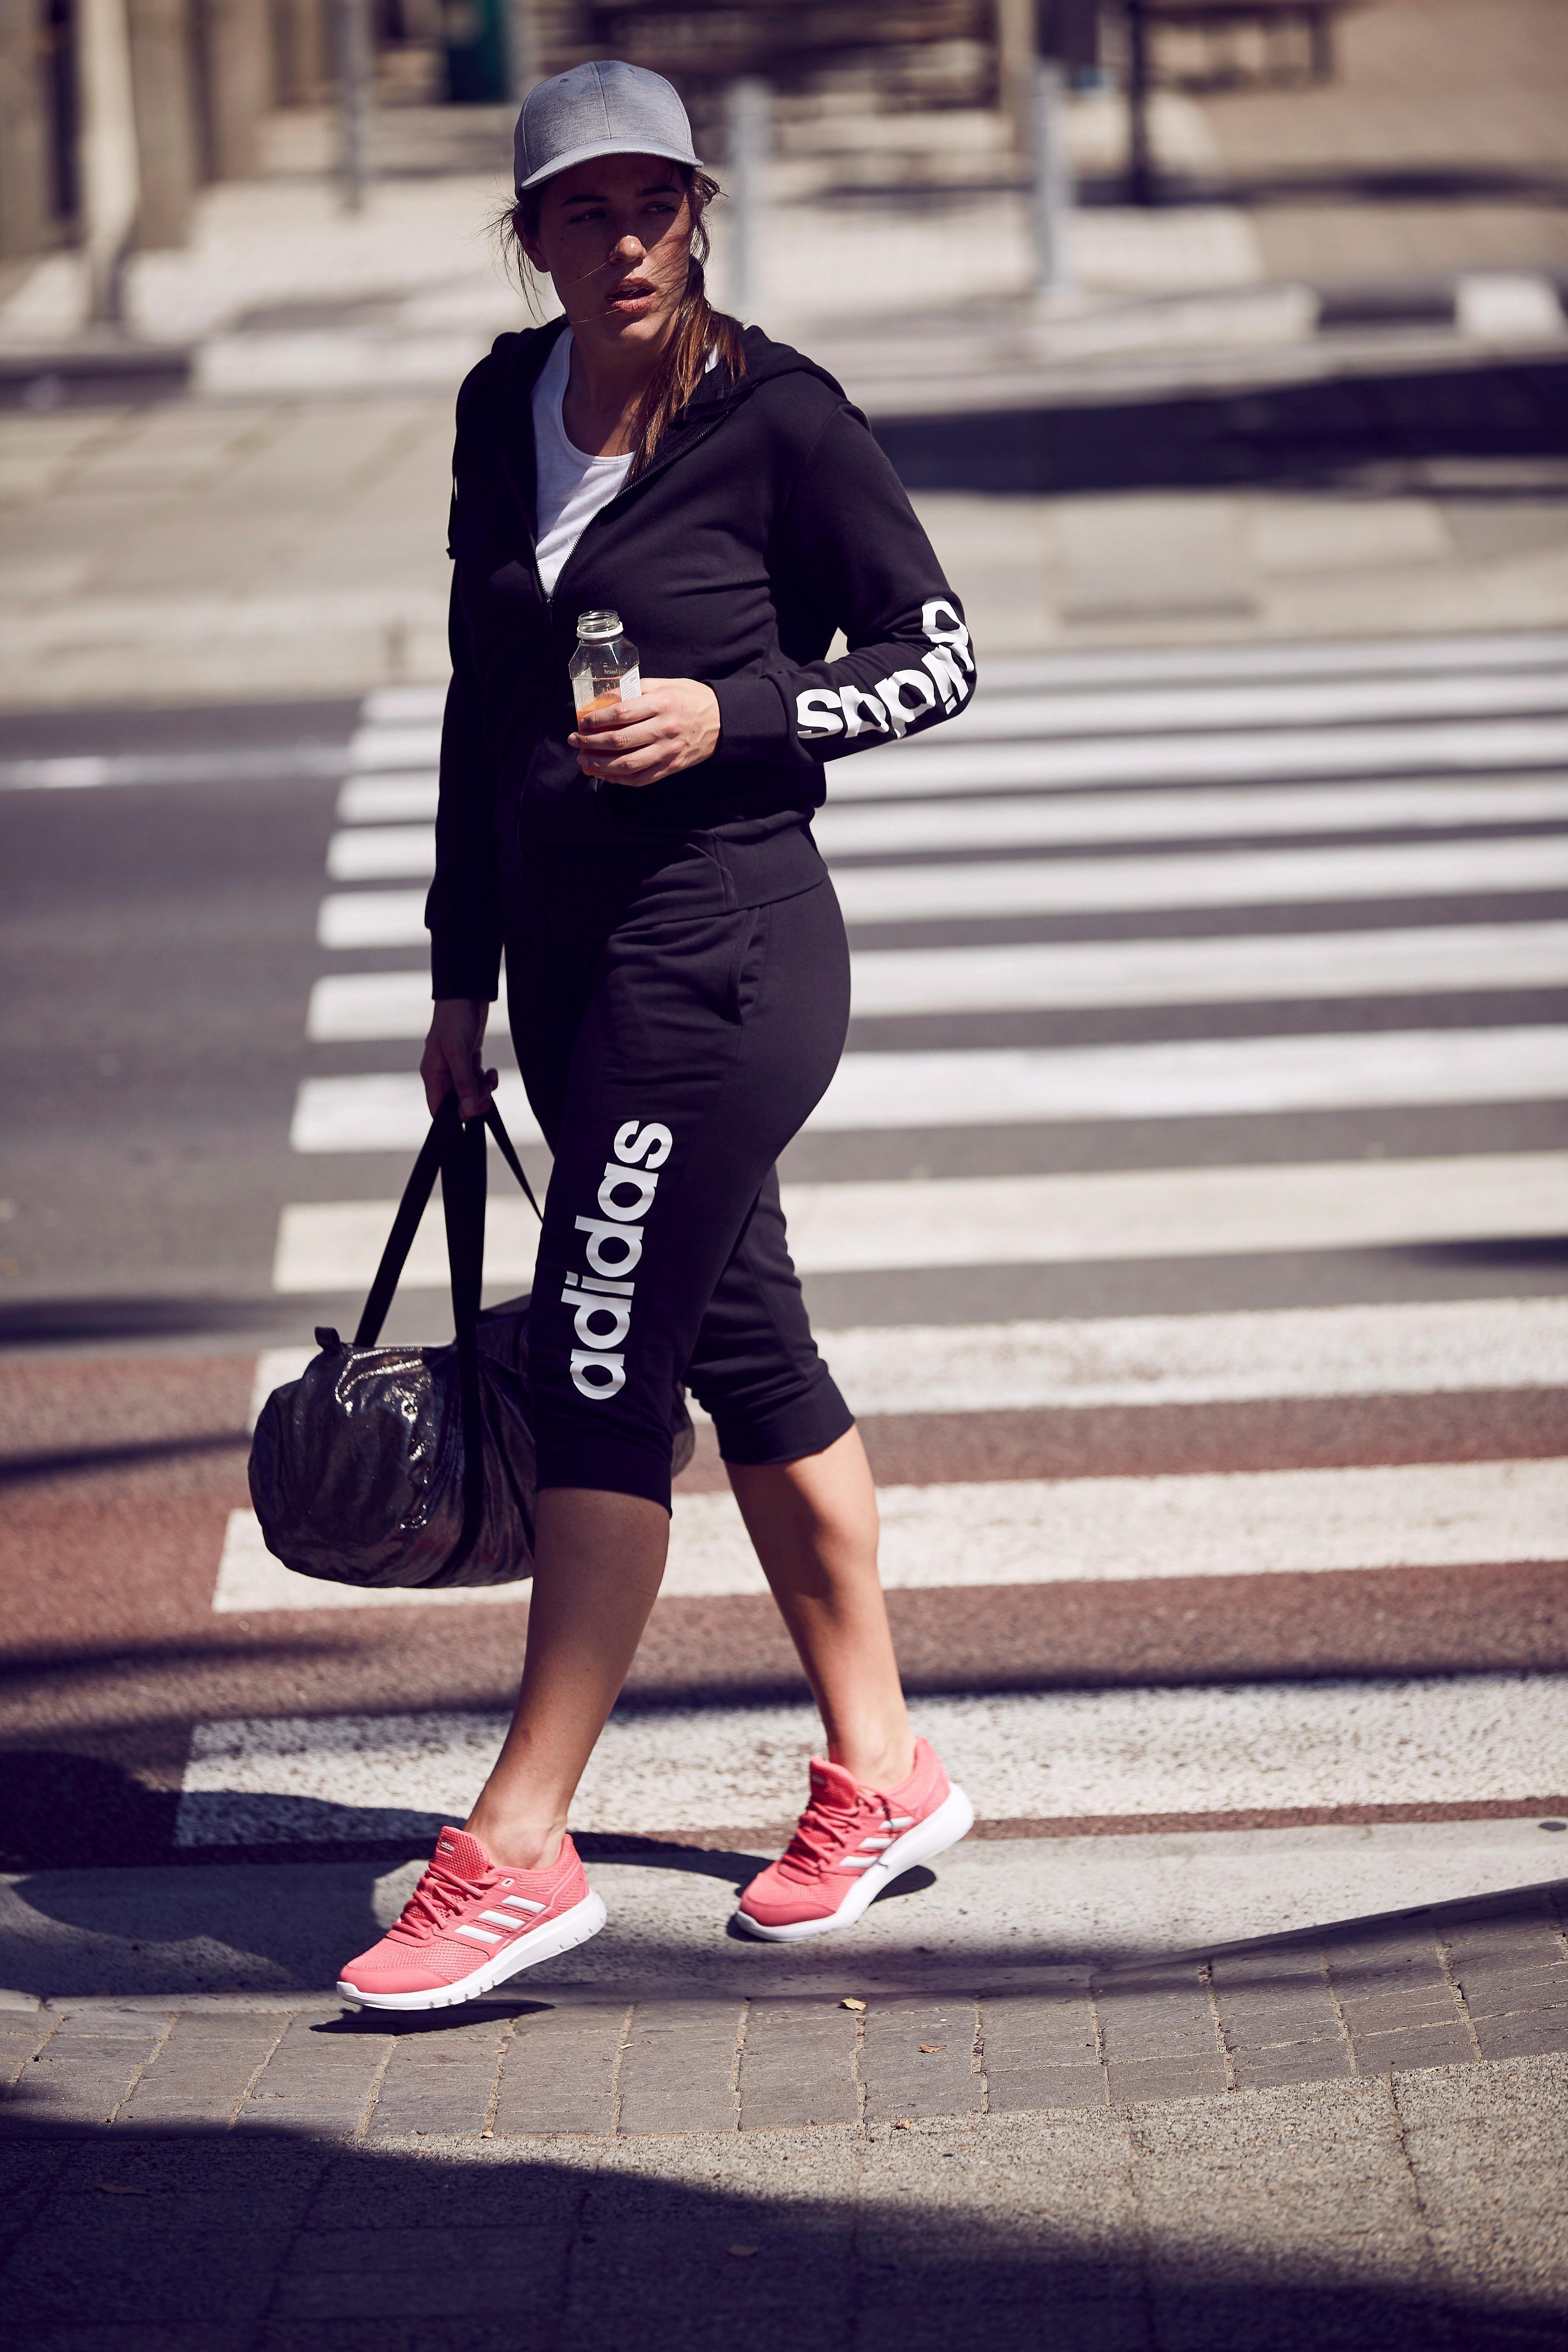 Linear Adidas Driekwartbroekessentials Pant Winkel De Performance 4 3 Online In zUVqMSGp